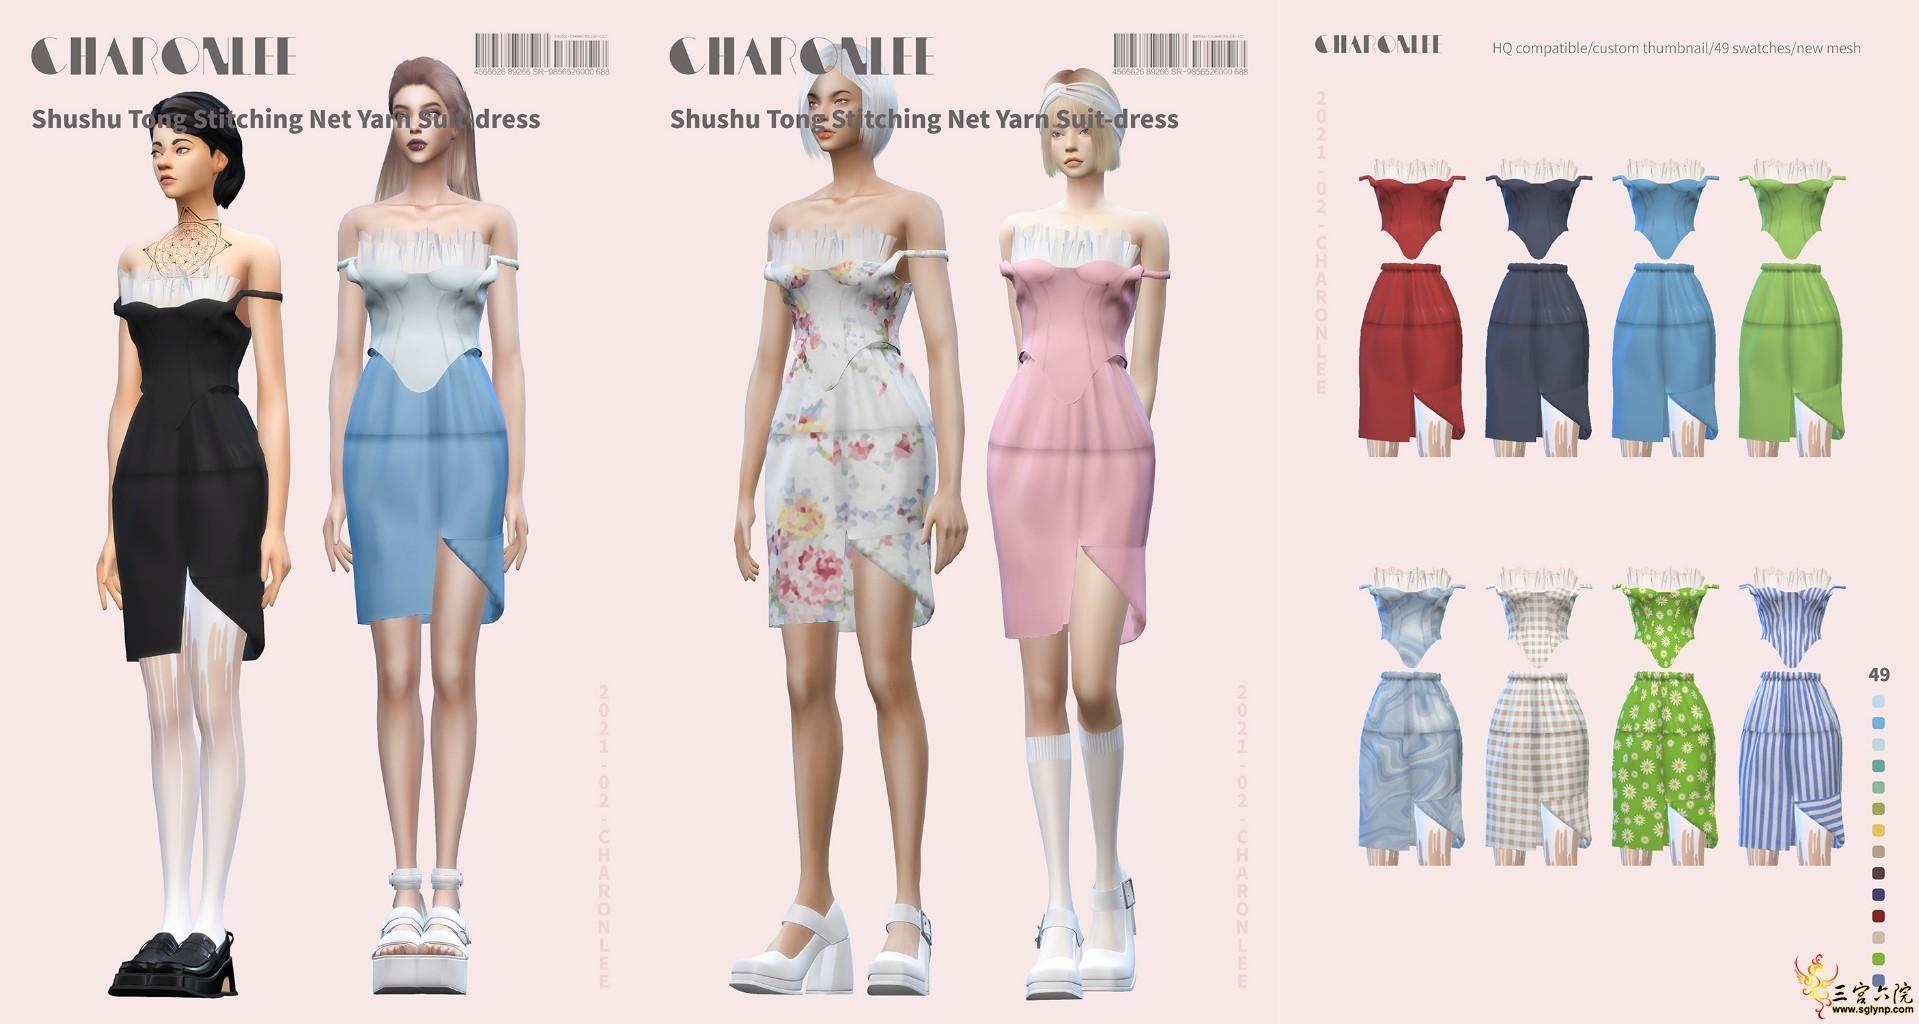 [CHARONLEE]2021-011-Shushu Tong Stitching Net Yarn Suit-dress.jpg